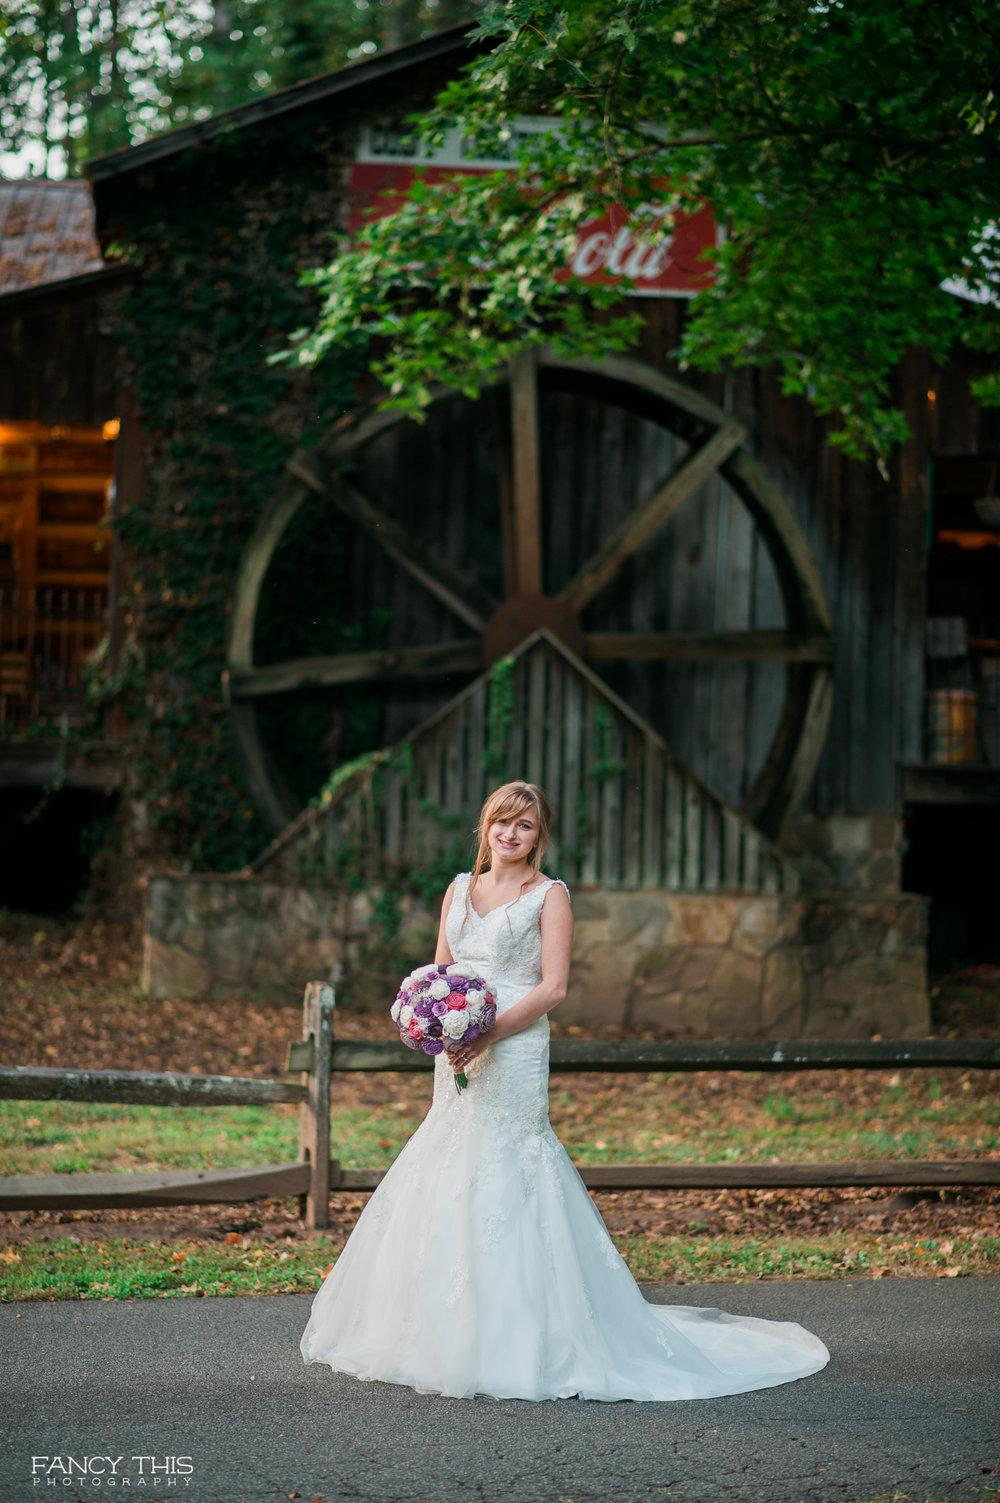 carolsimchik_bridals_socialmediaready-47.jpg